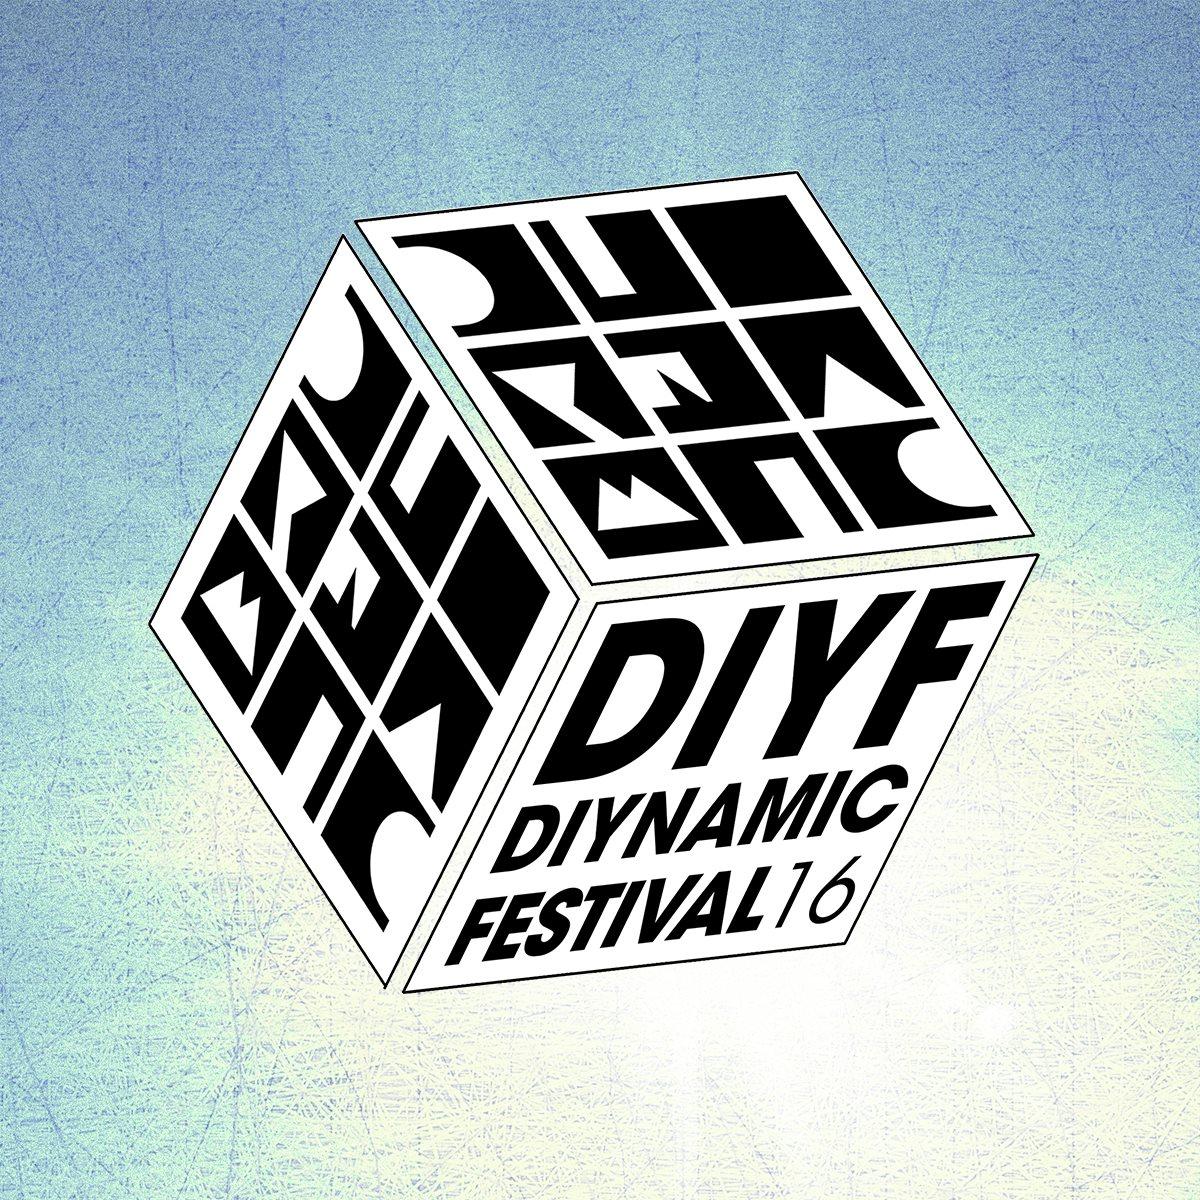 Diynamic Festival 2016: Das Line-up steht